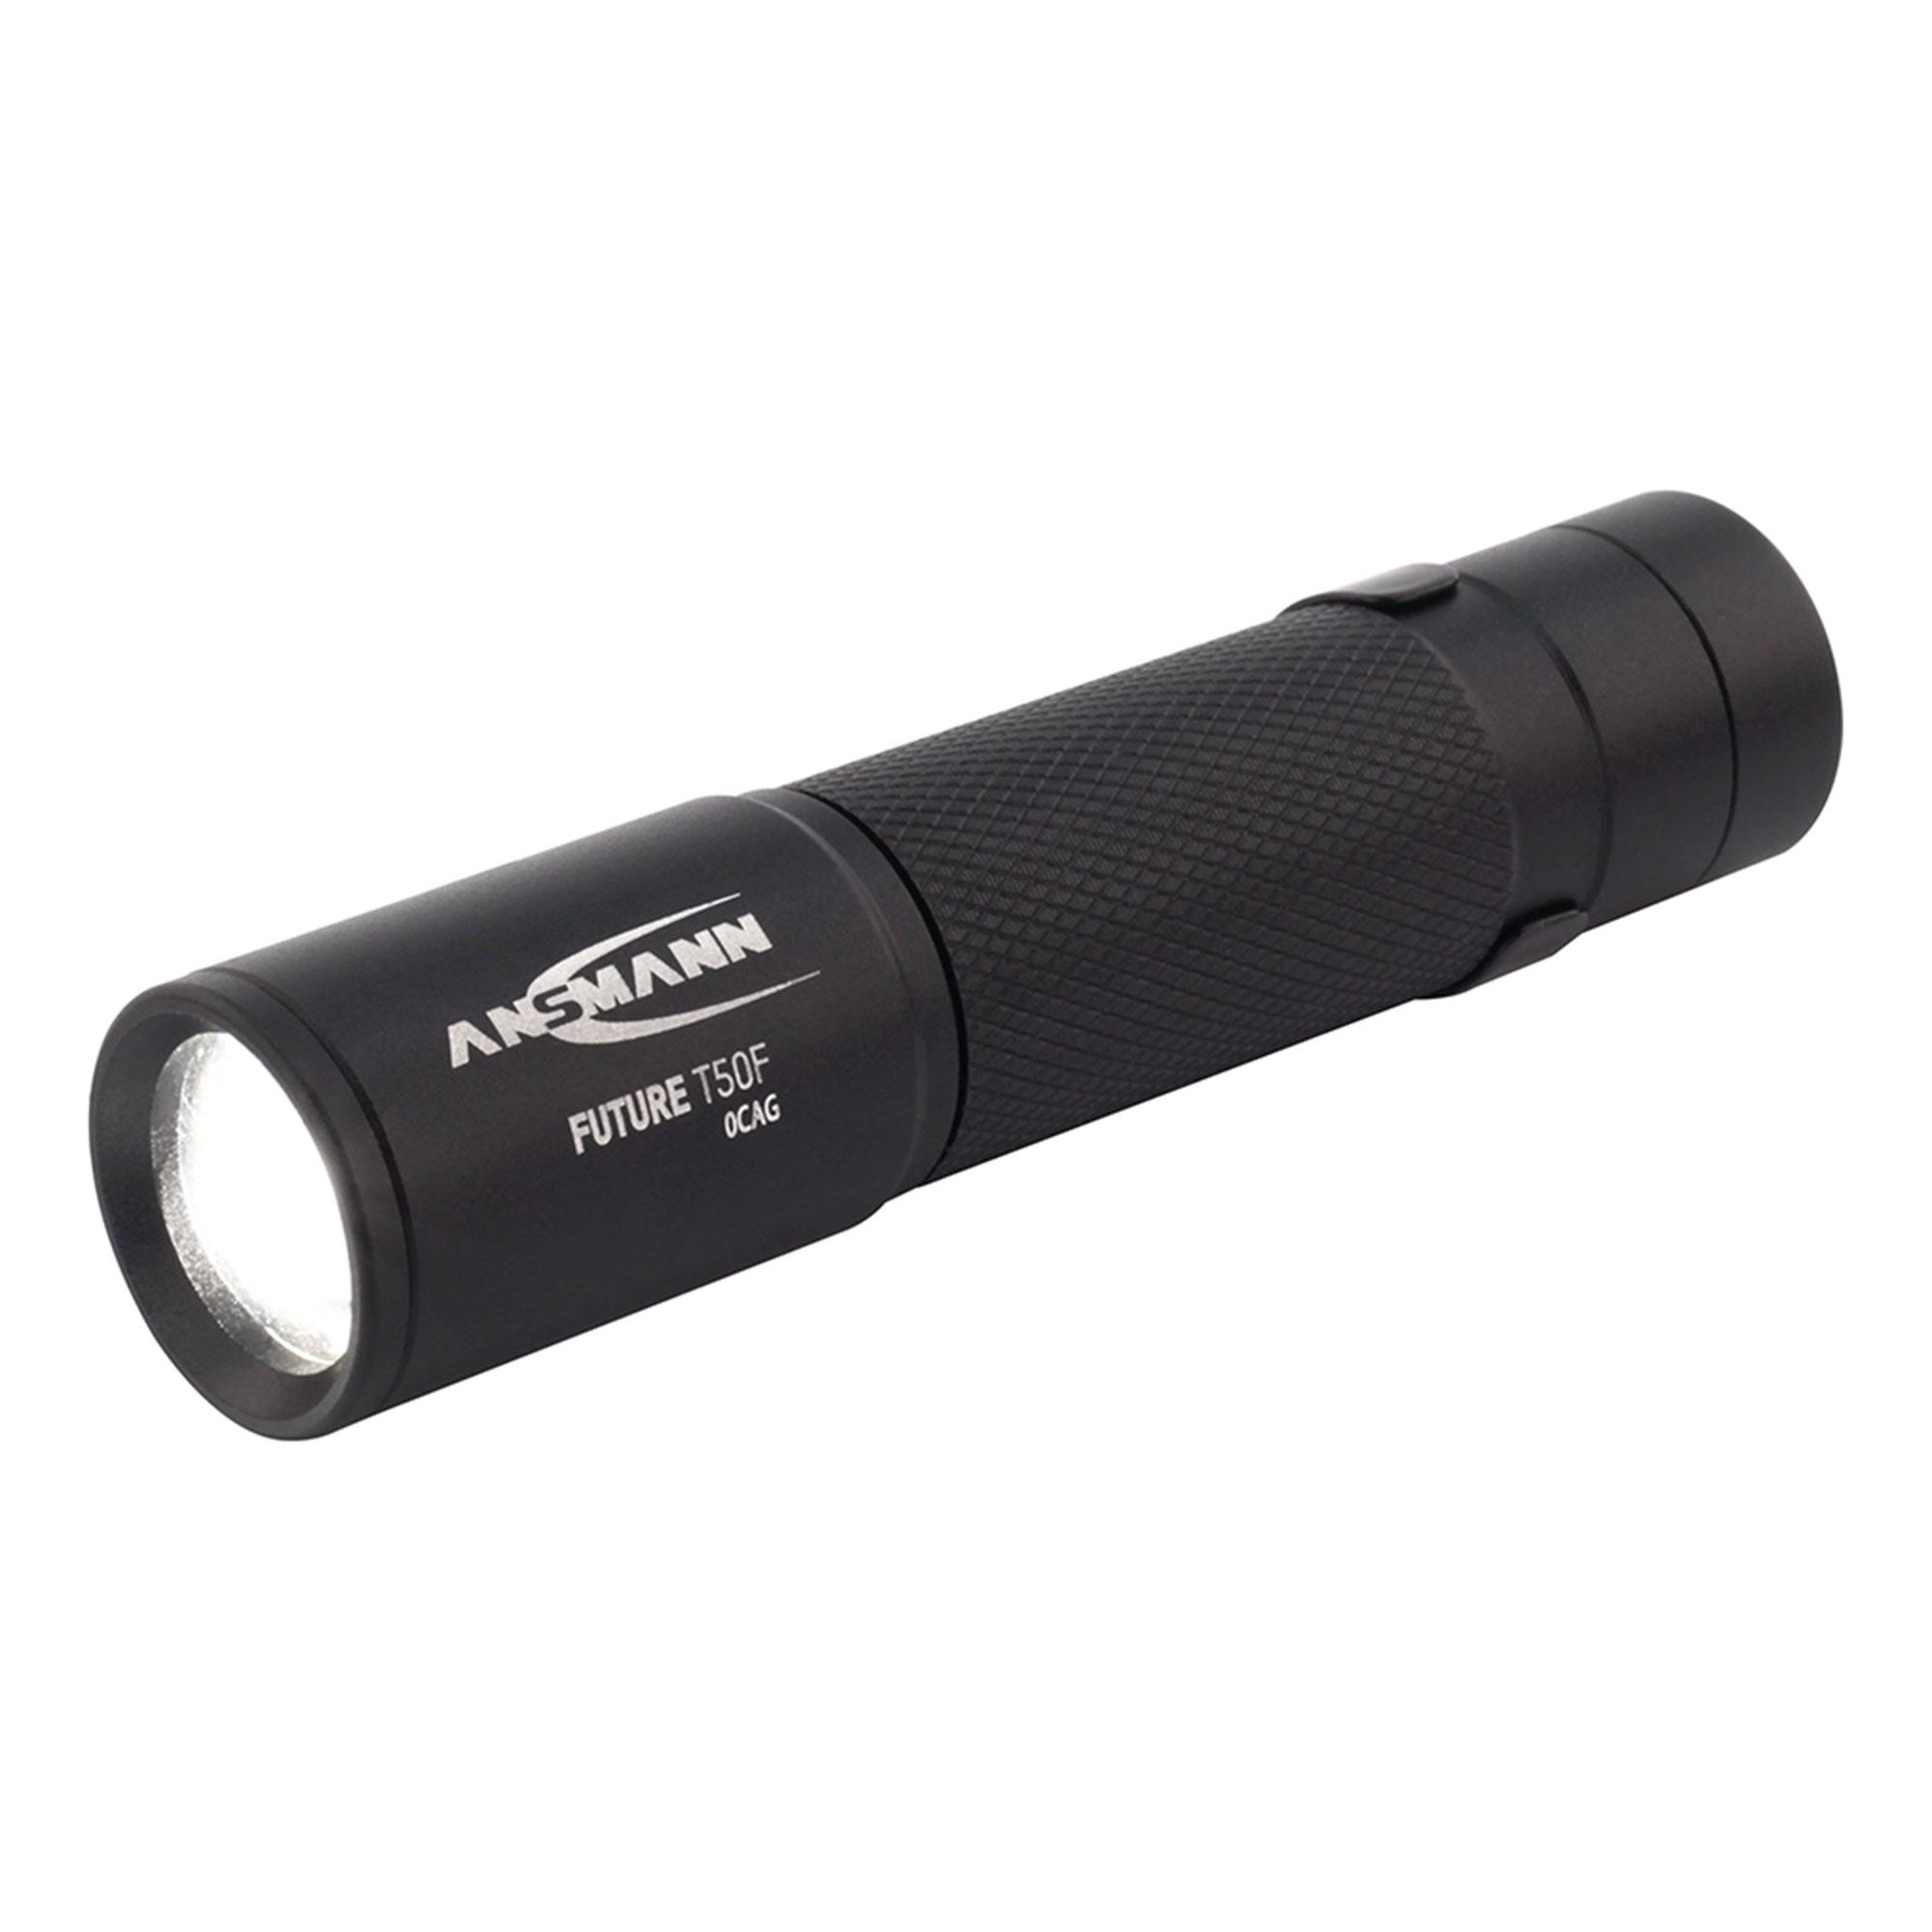 Afbeelding van 4013674110865 LED zaklamp Focus 60Lm